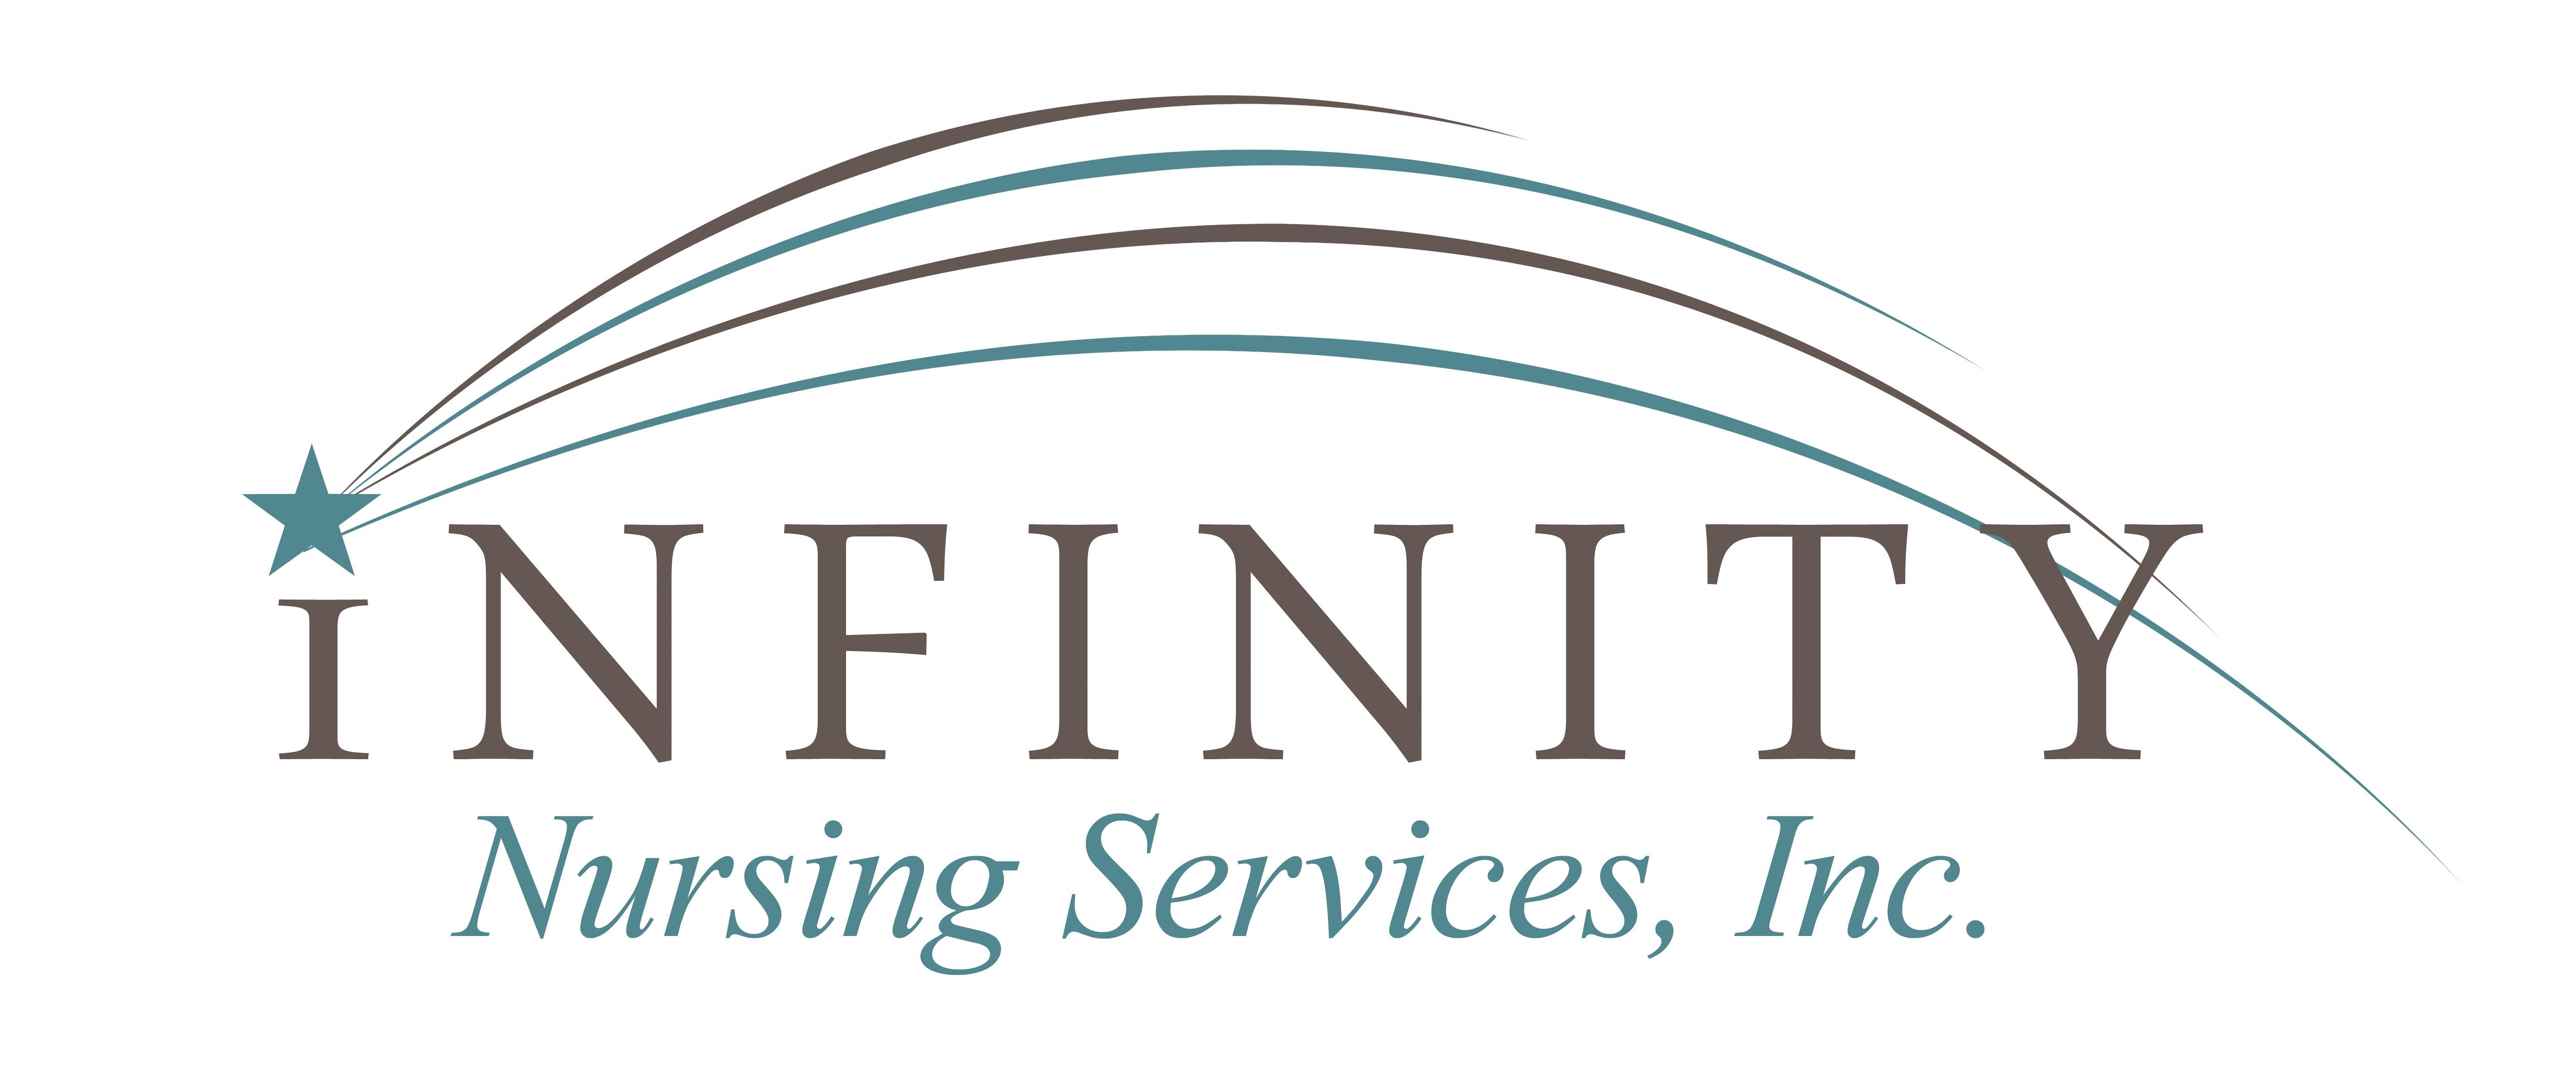 Infinity Nursing Services